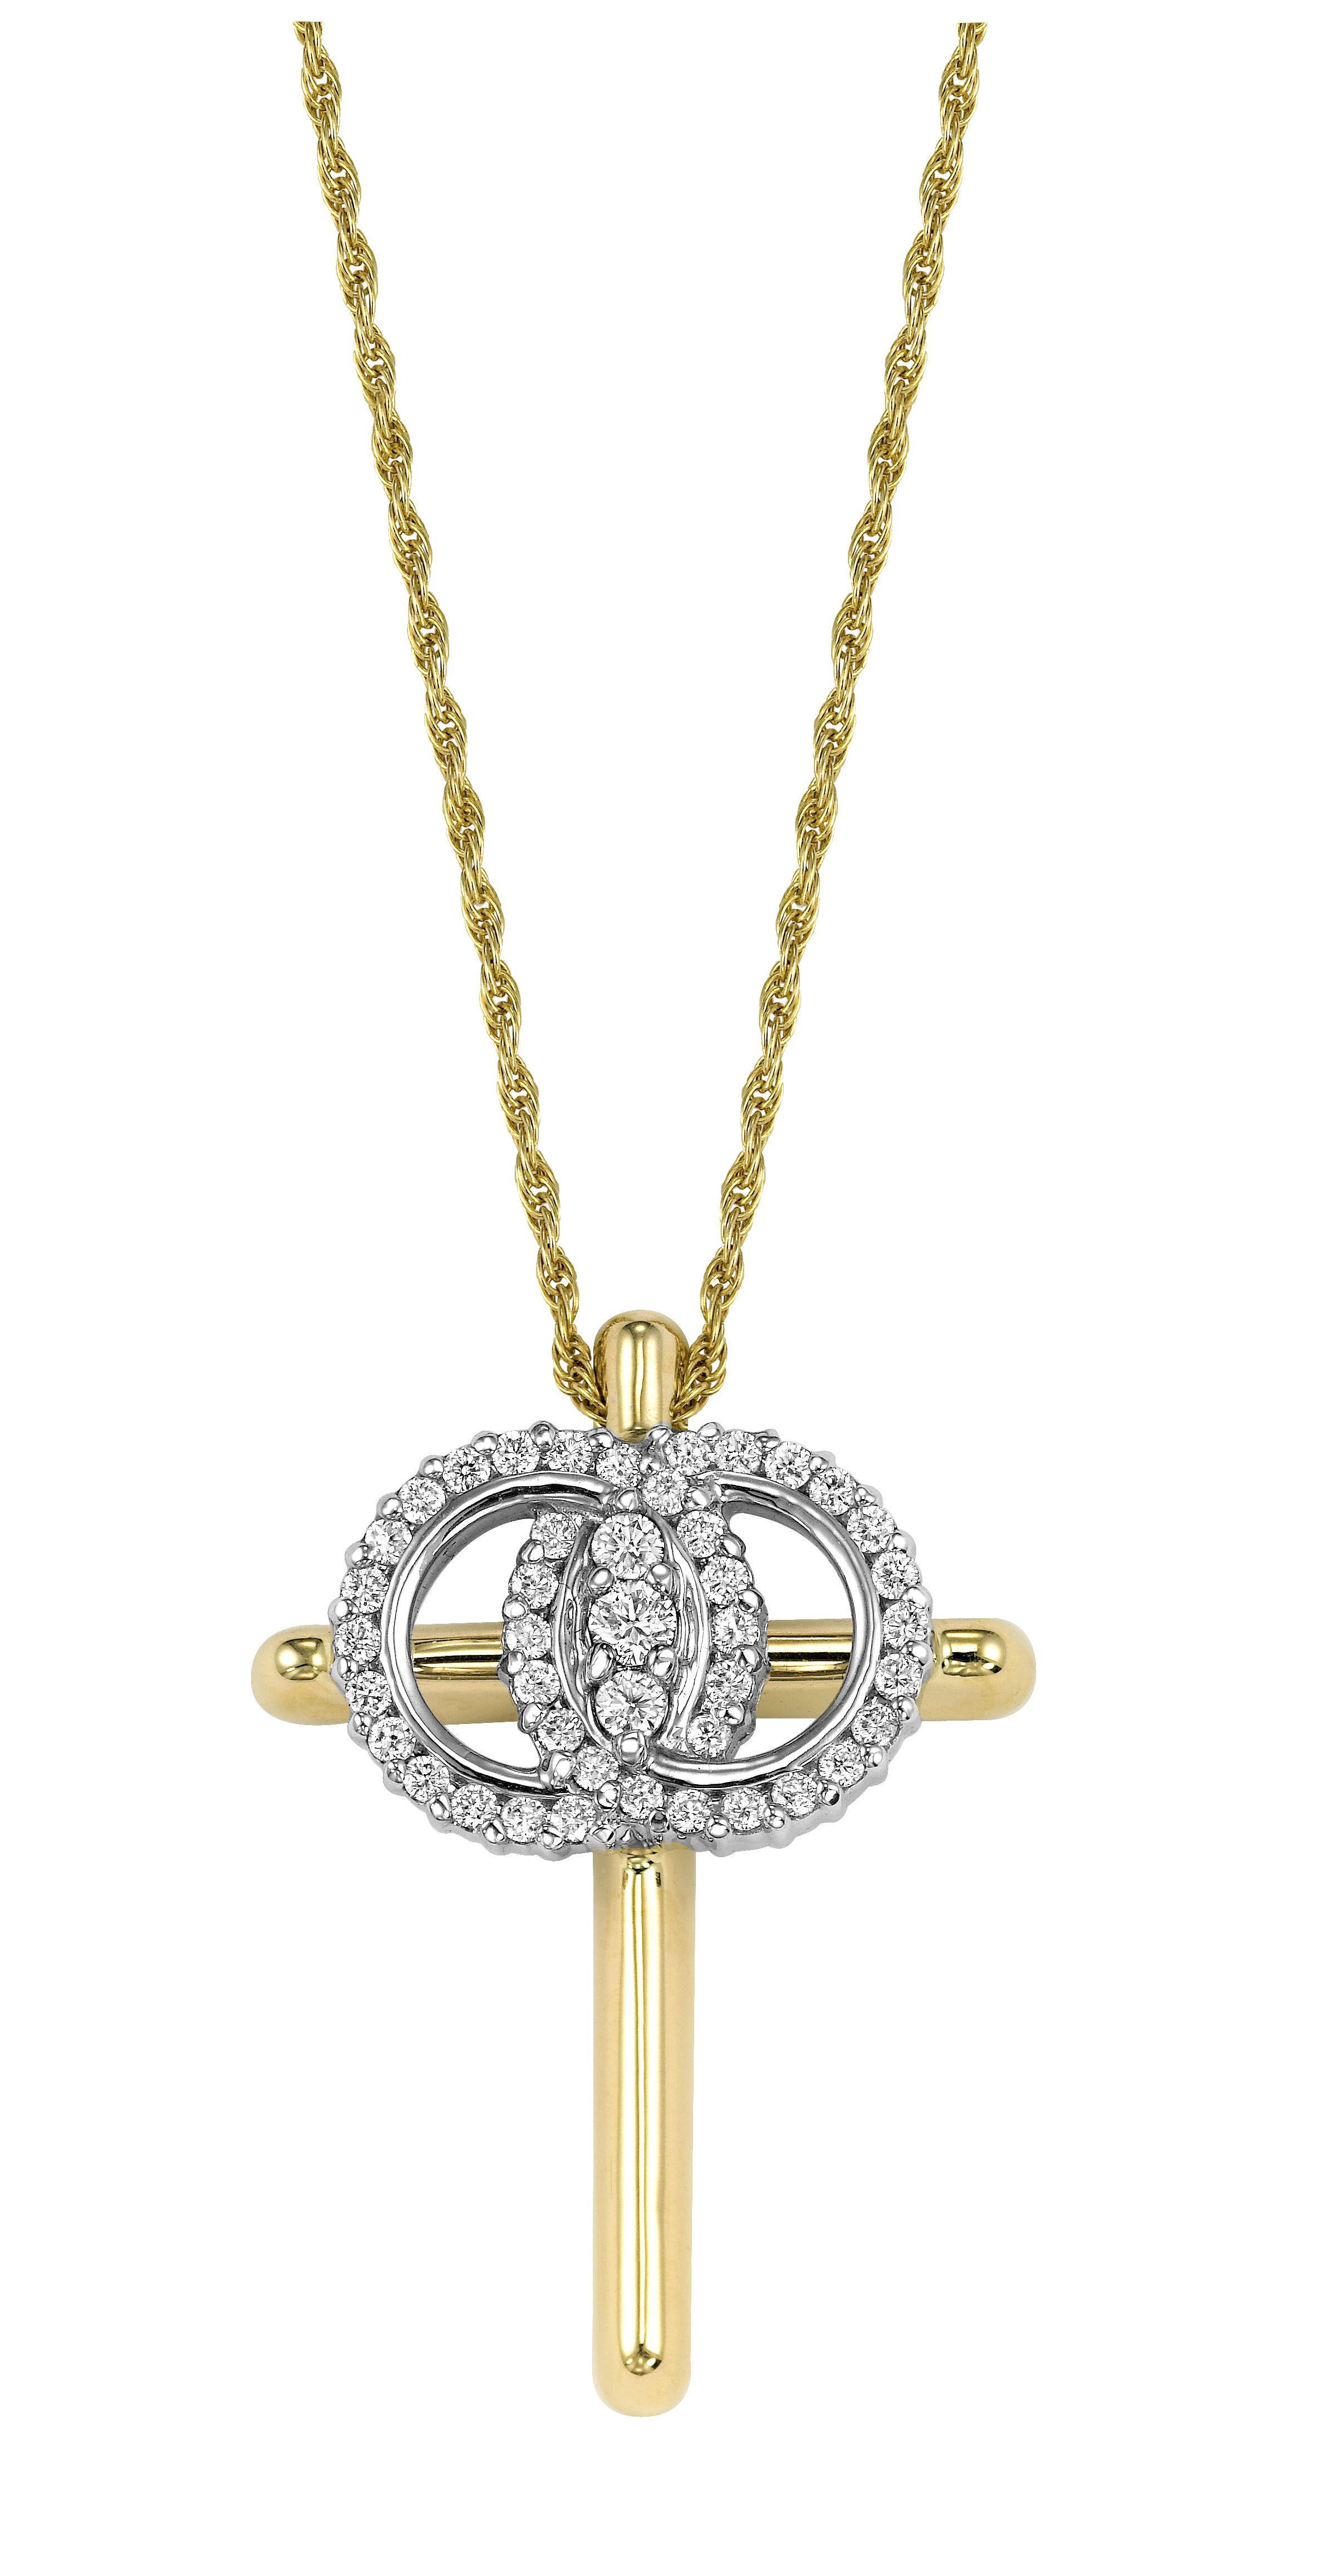 Christian Marriage Symbol Marriage symbols, Jewelry